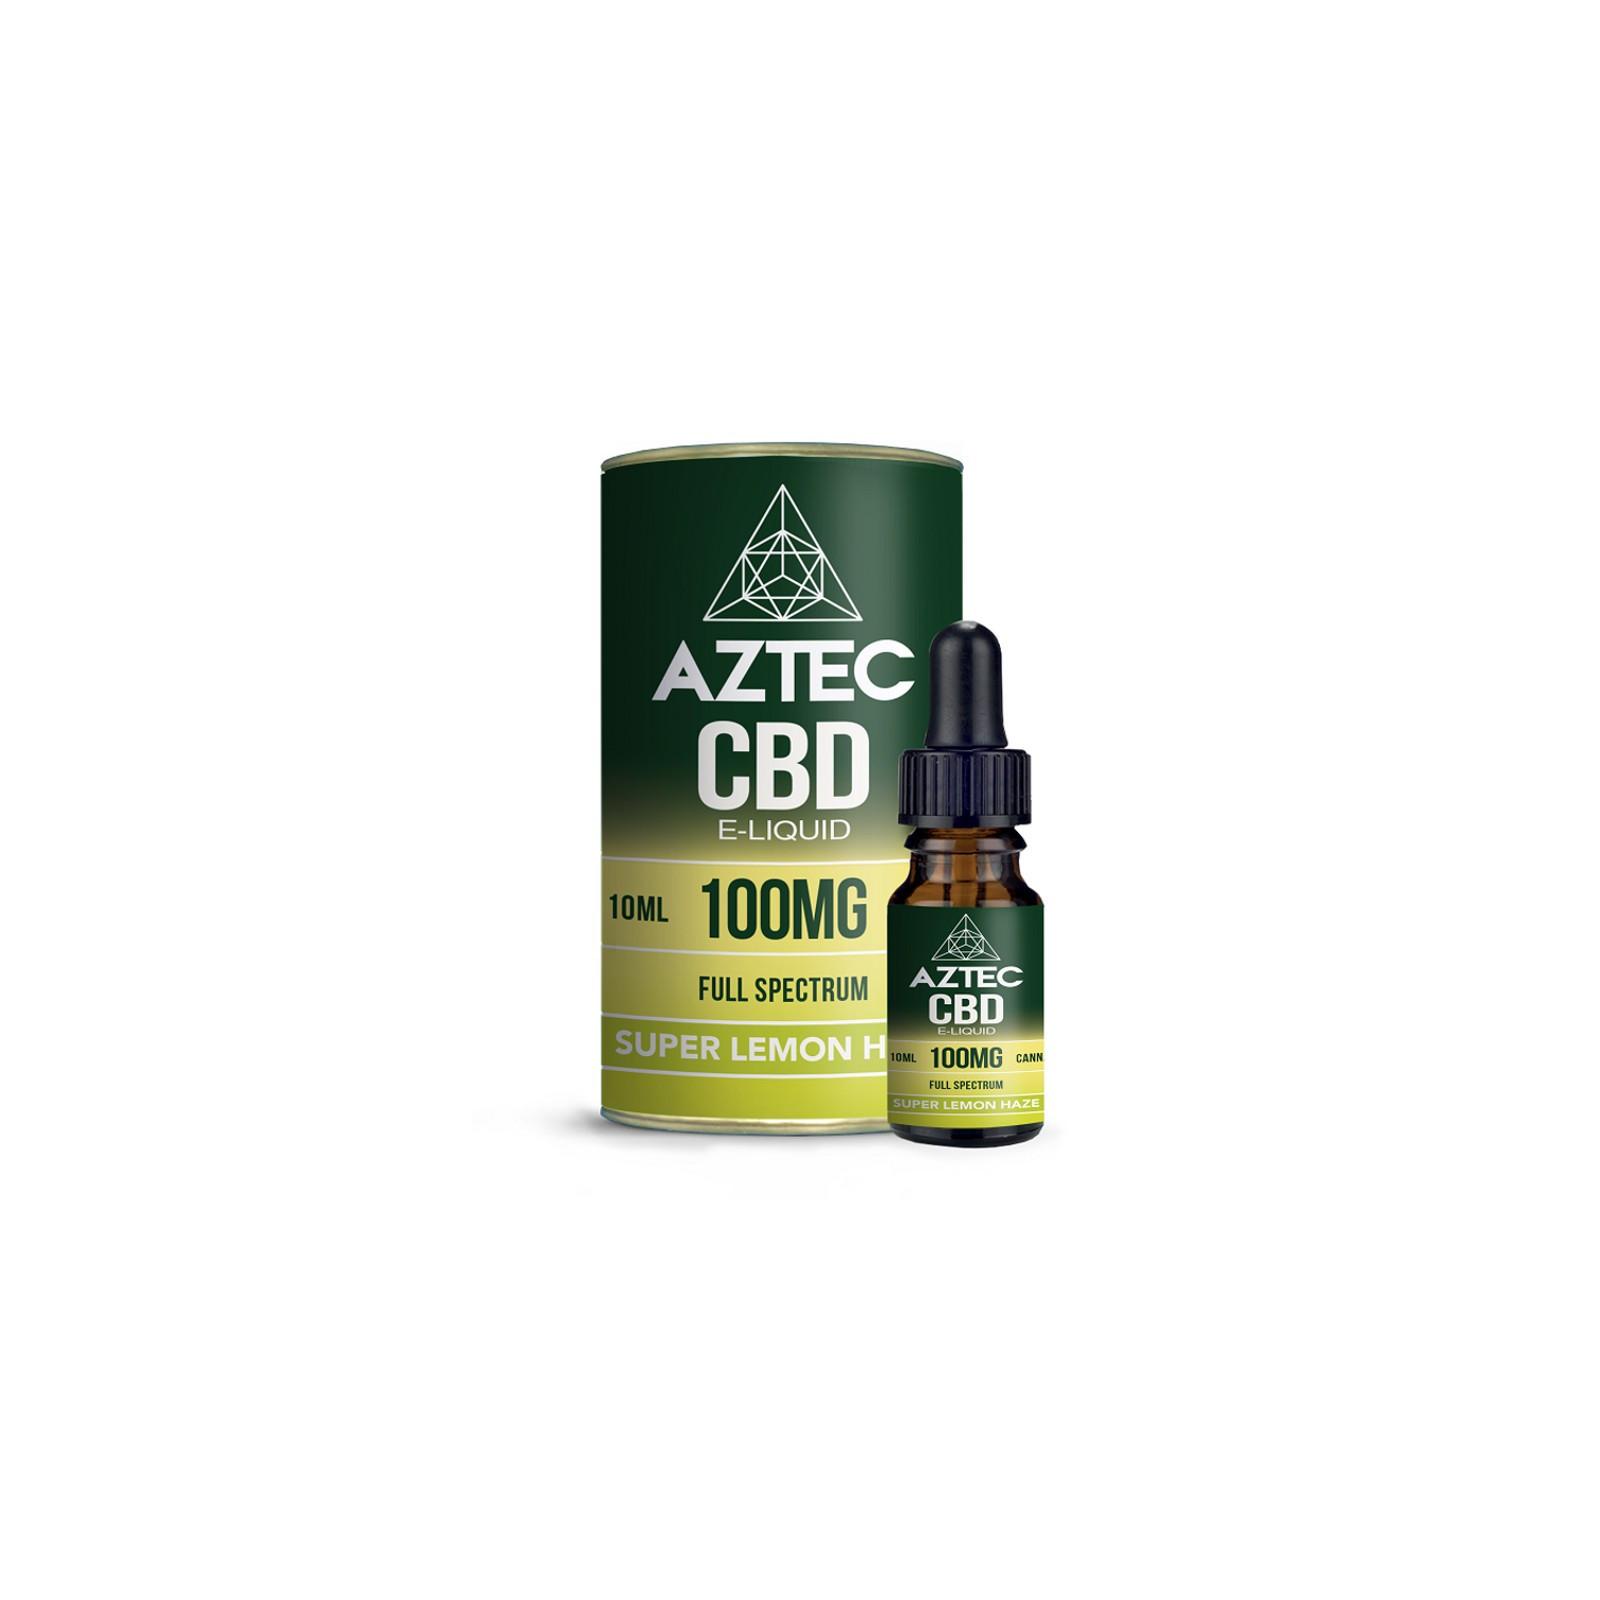 Super Lemon Haze Aztec CBD Full Spectrum